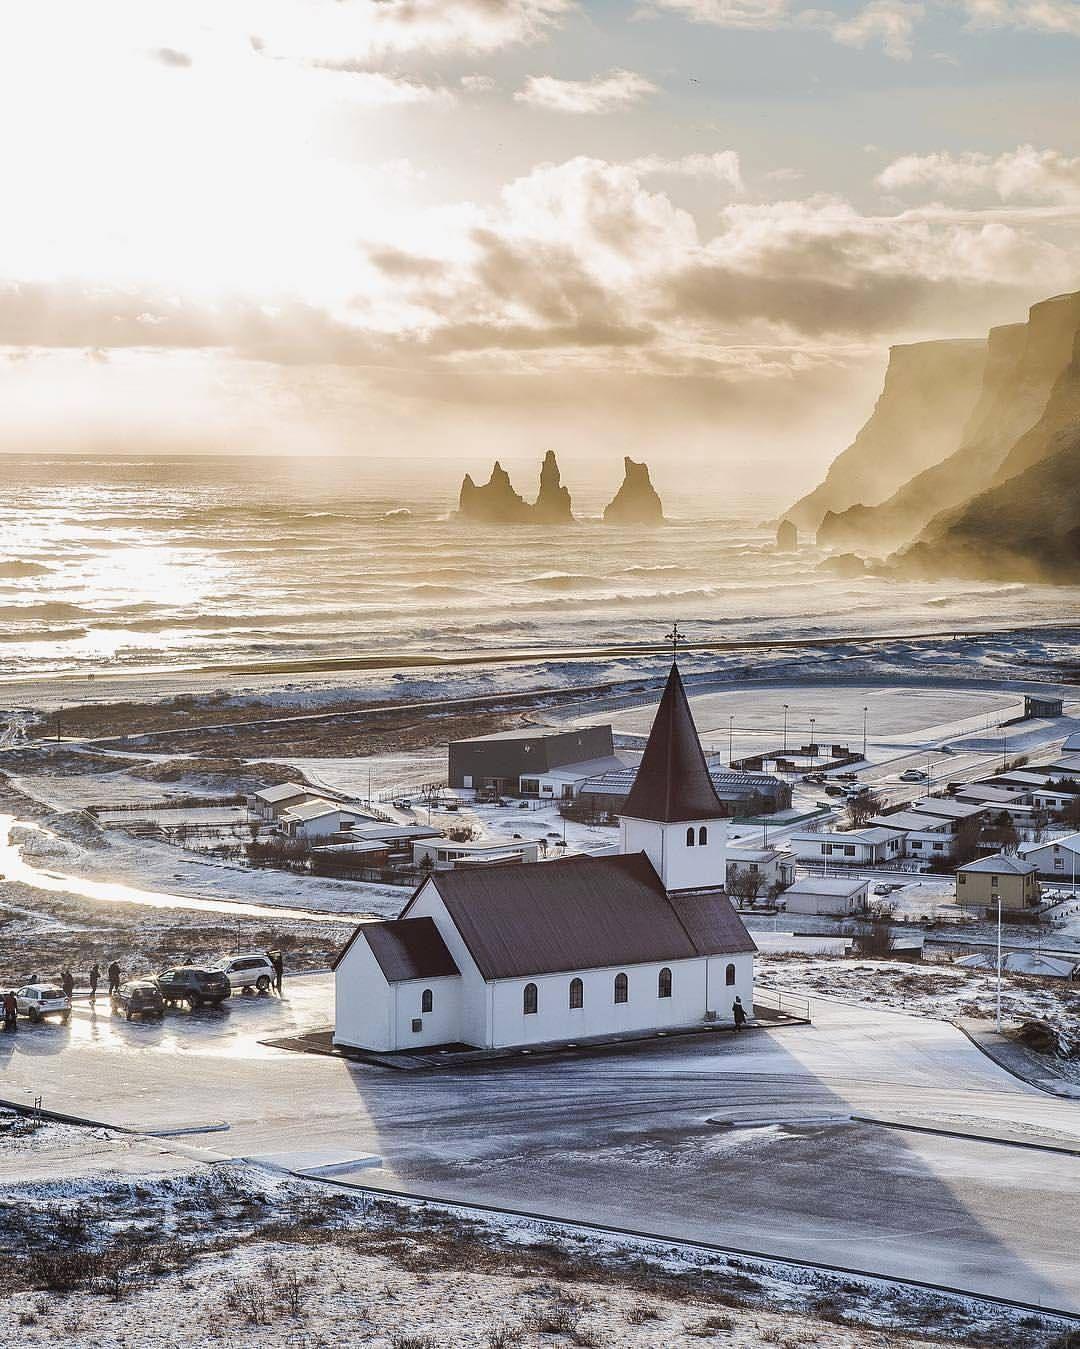 "Wake Up Reykjavík (@wakeupreykjavik) on Instagram: ""Golden hour at Vík. Photo by: @mario.brighenti"""